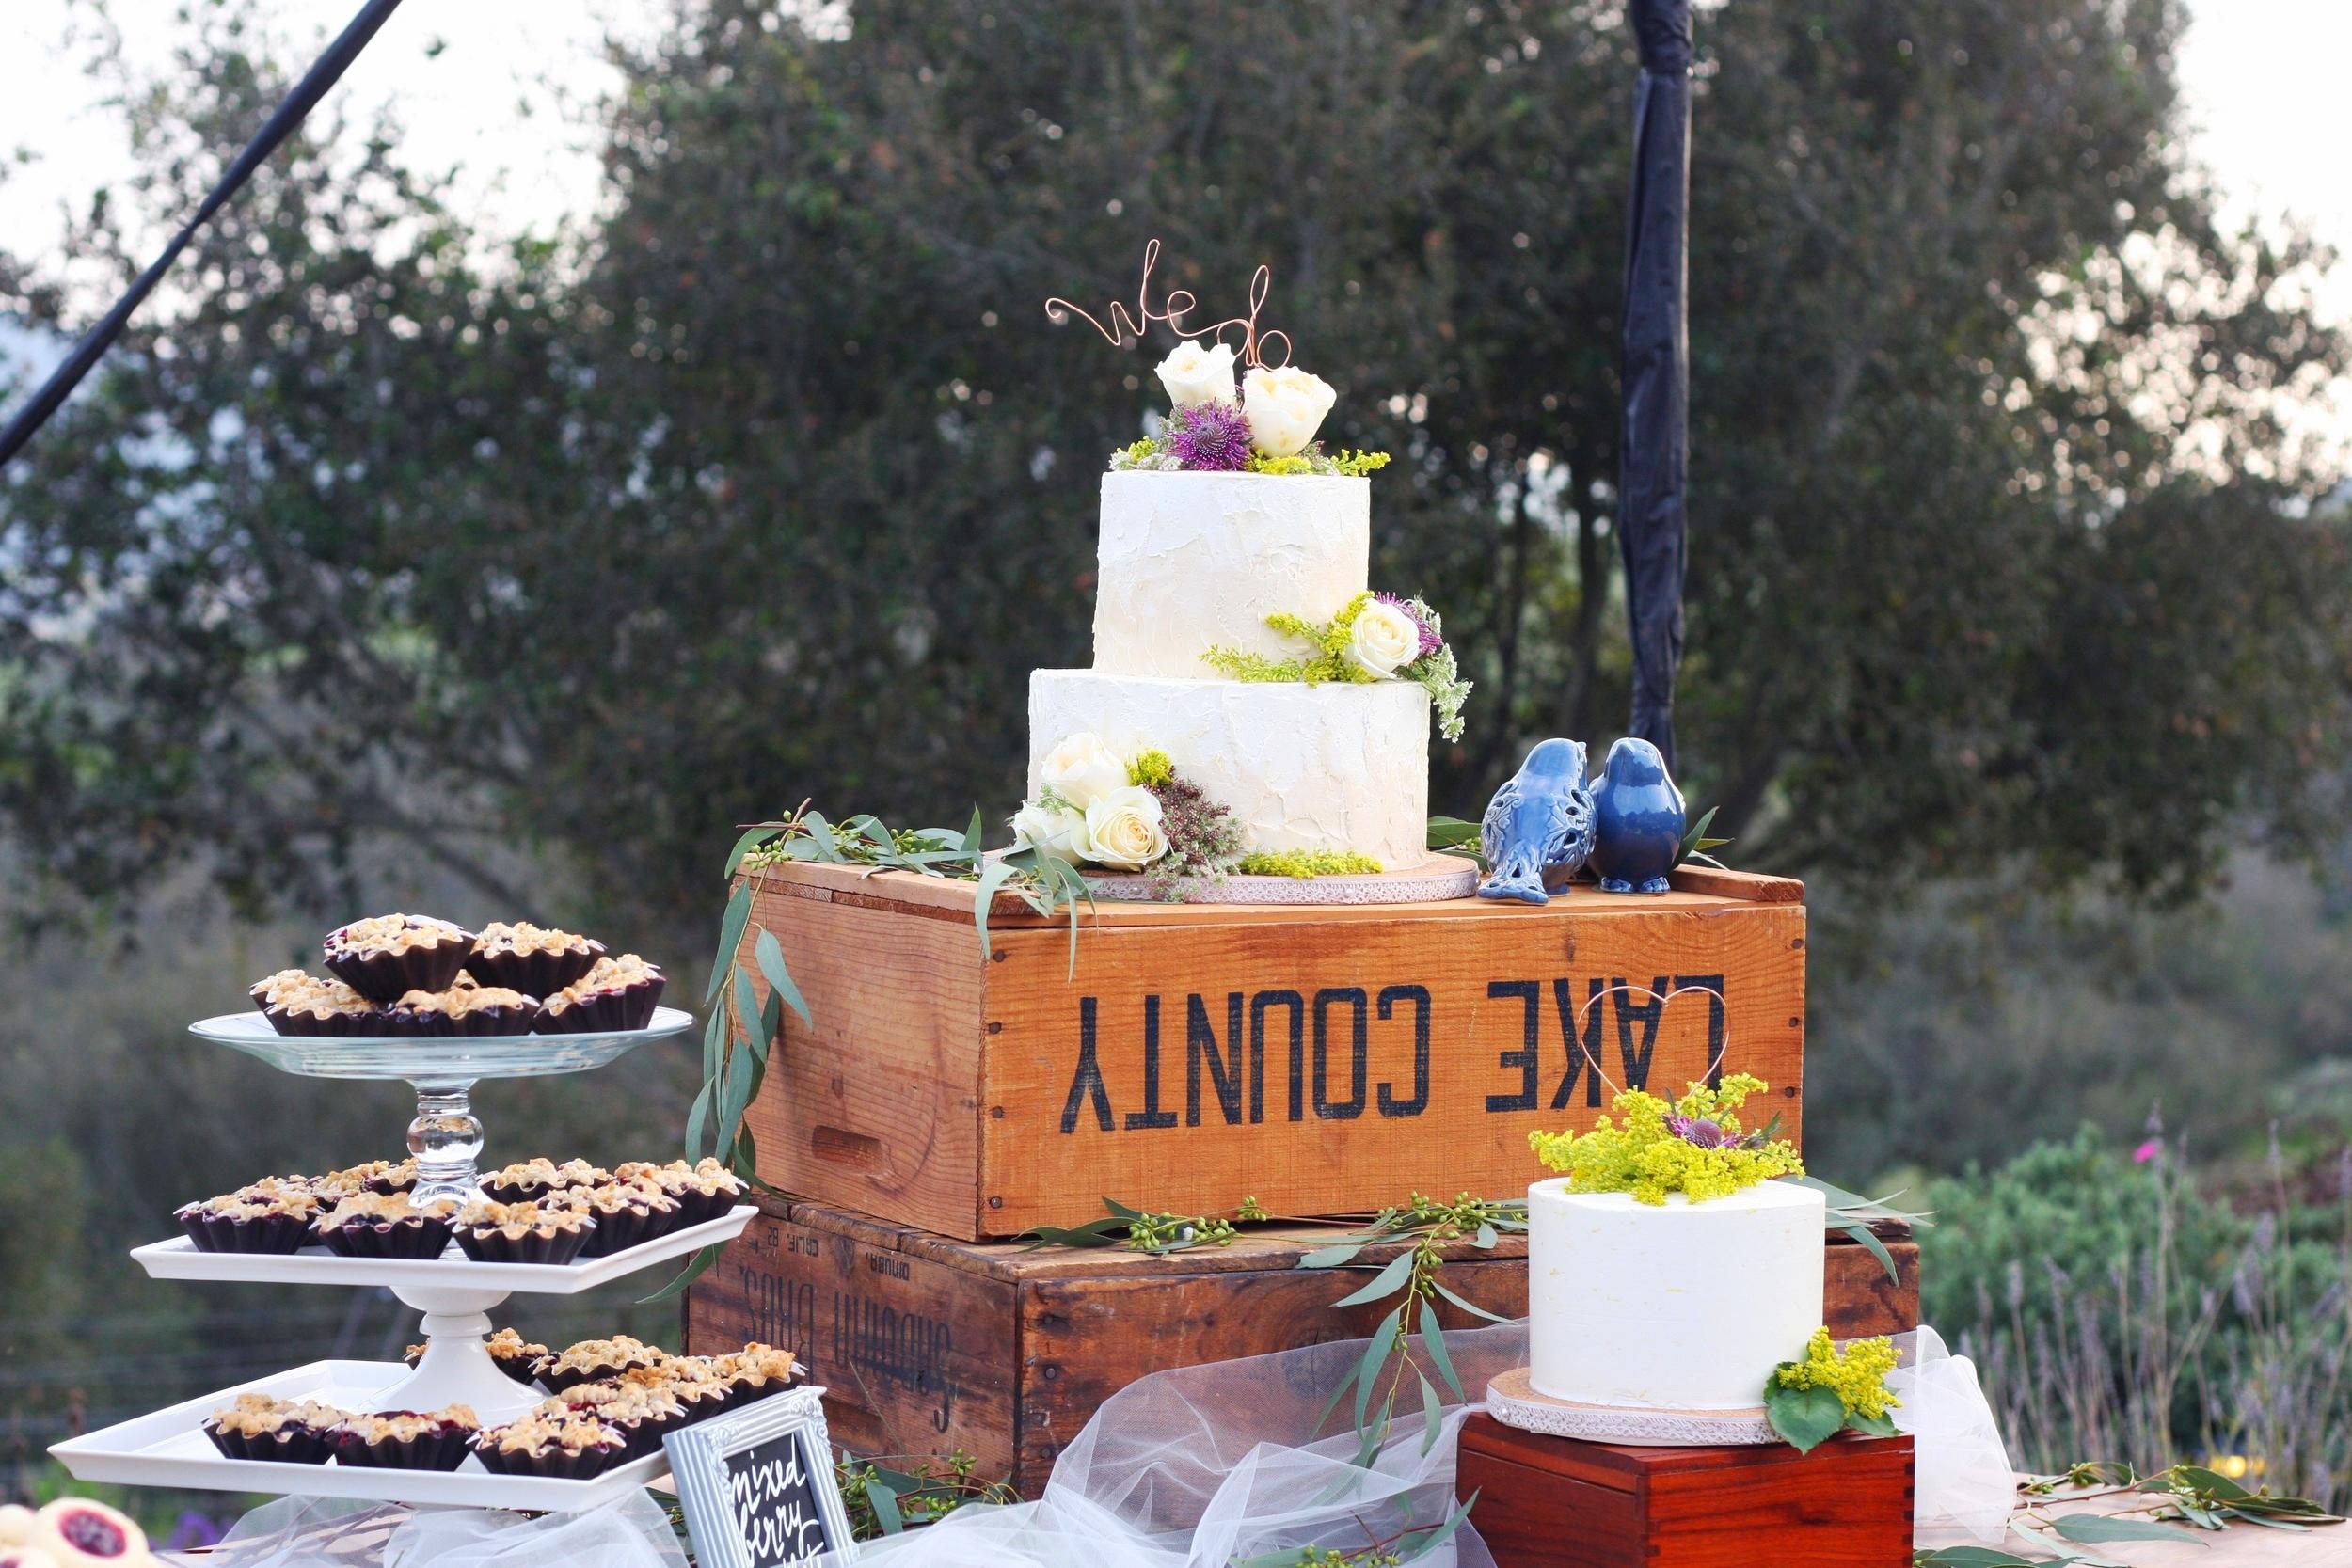 Dessert Buffet & Wedding Cake at the Casitas Estate, Arroyo Grande